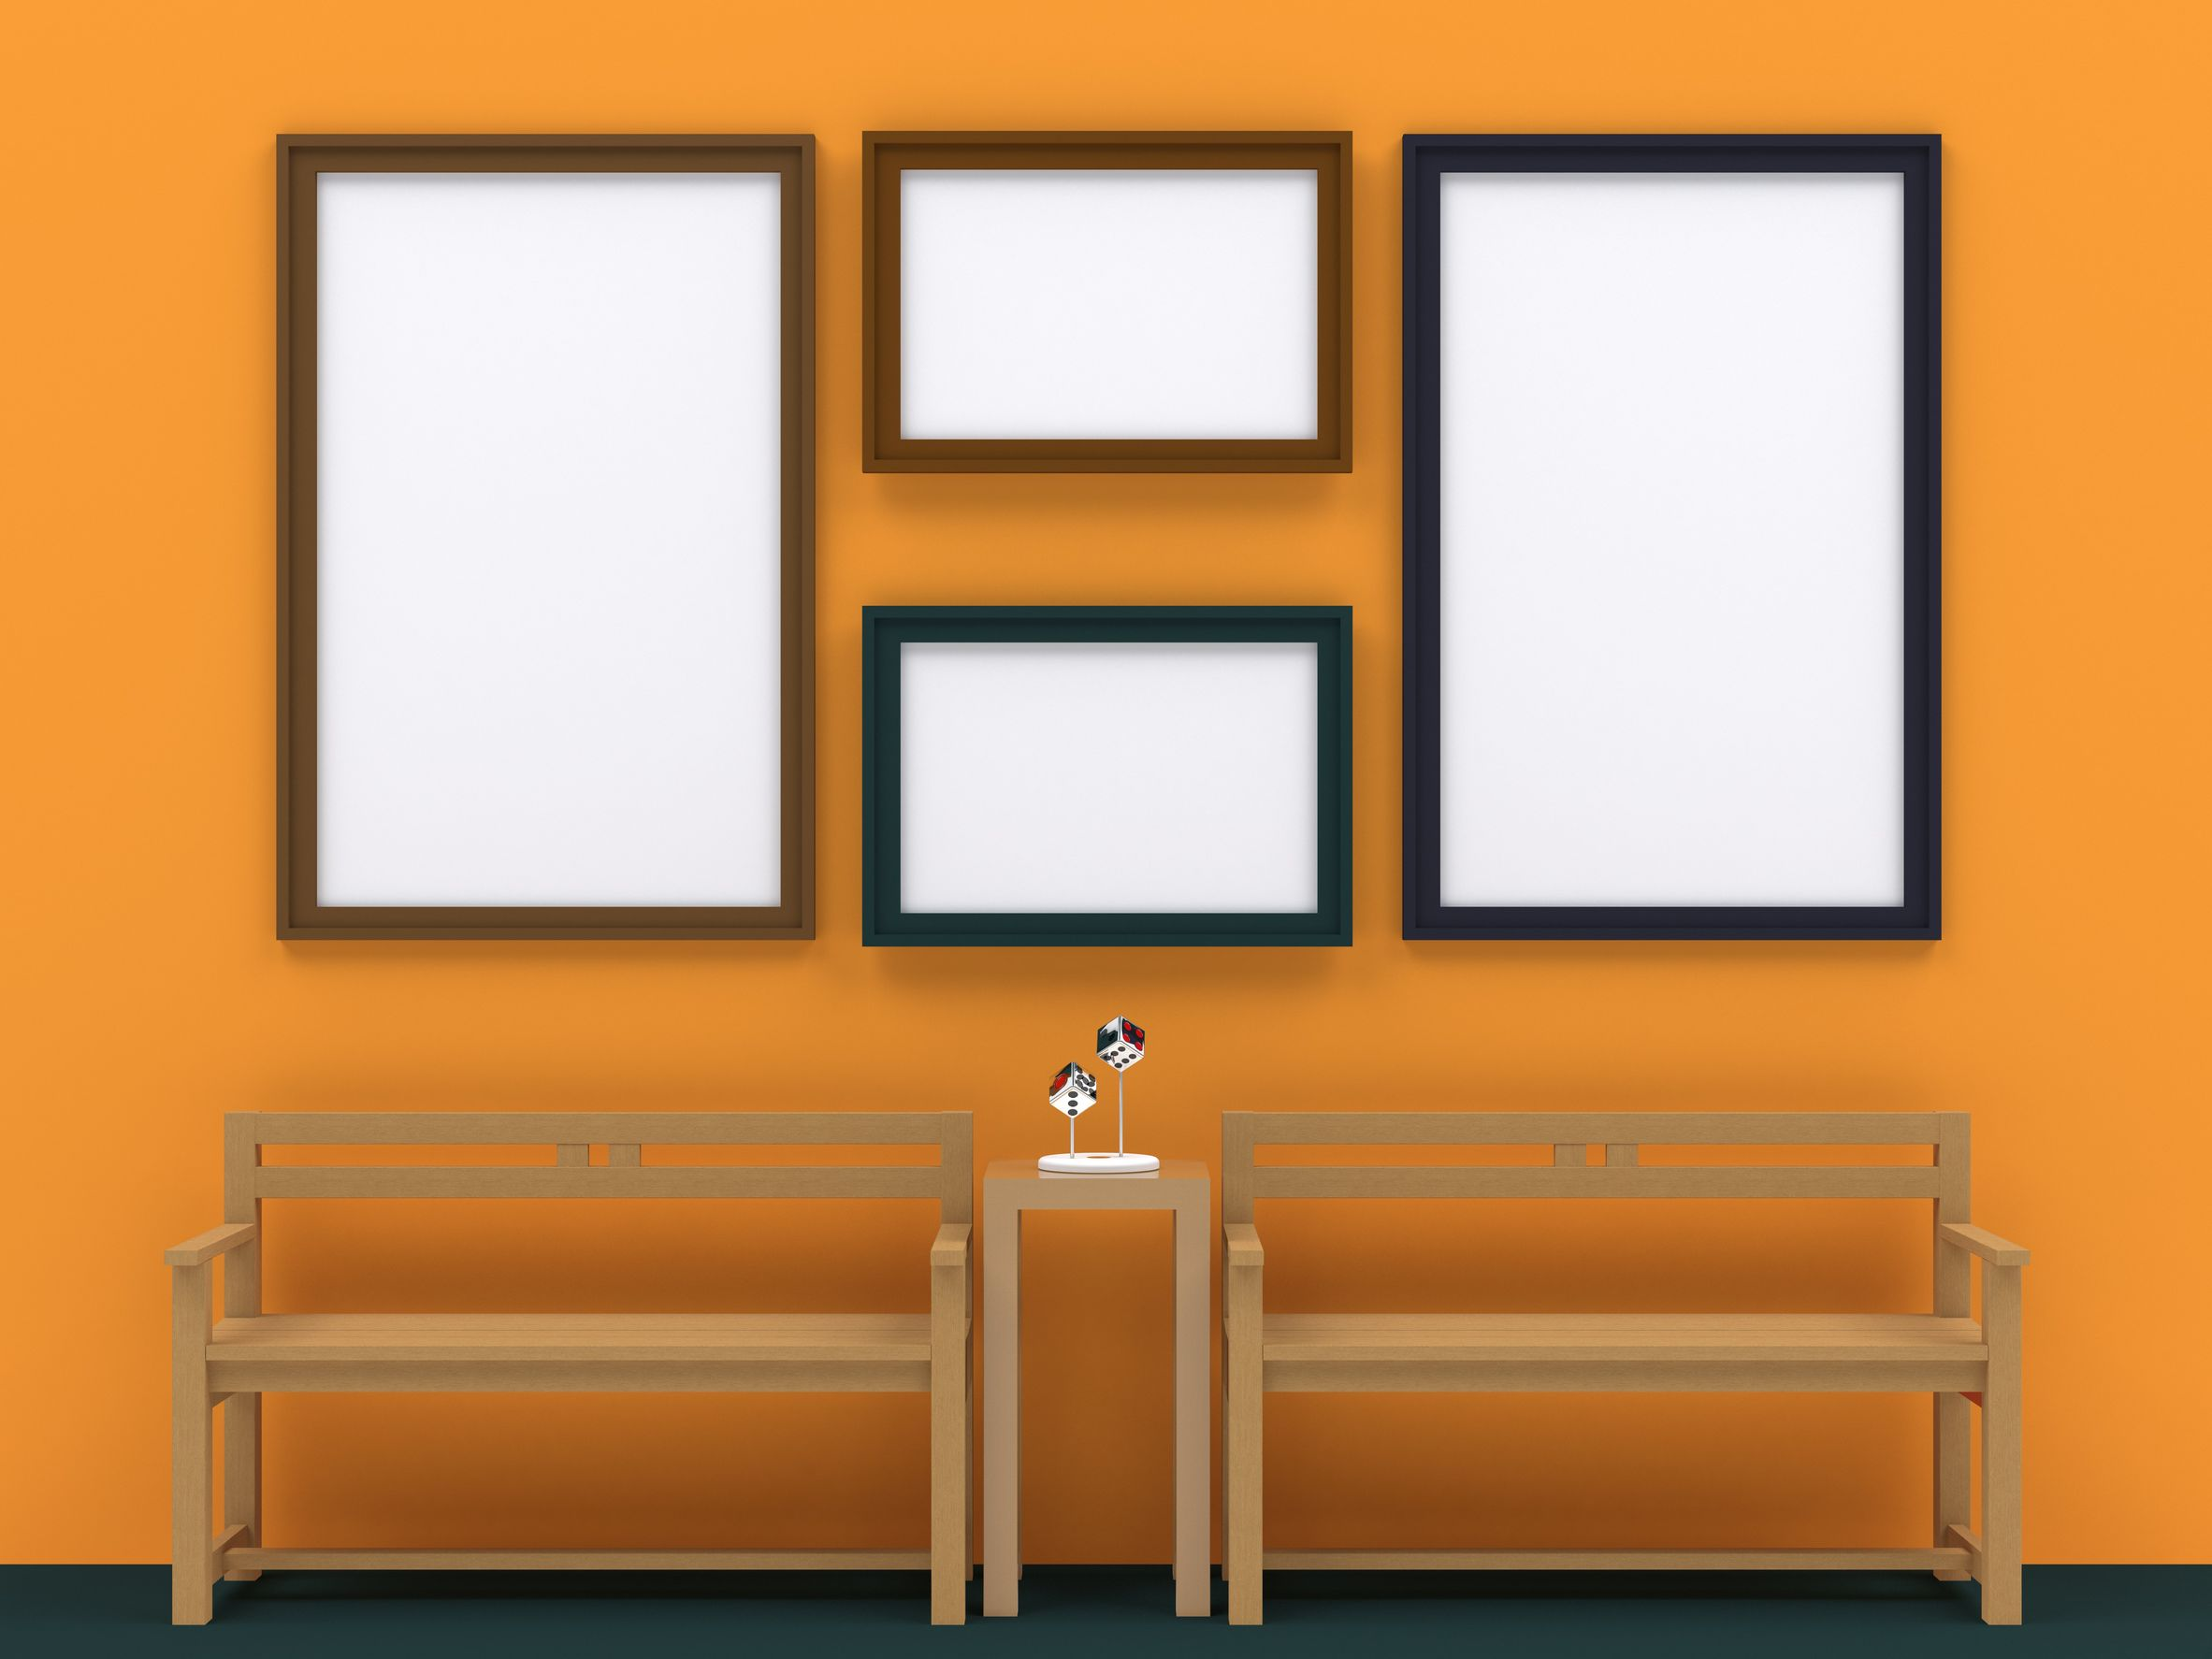 cadres rectangle